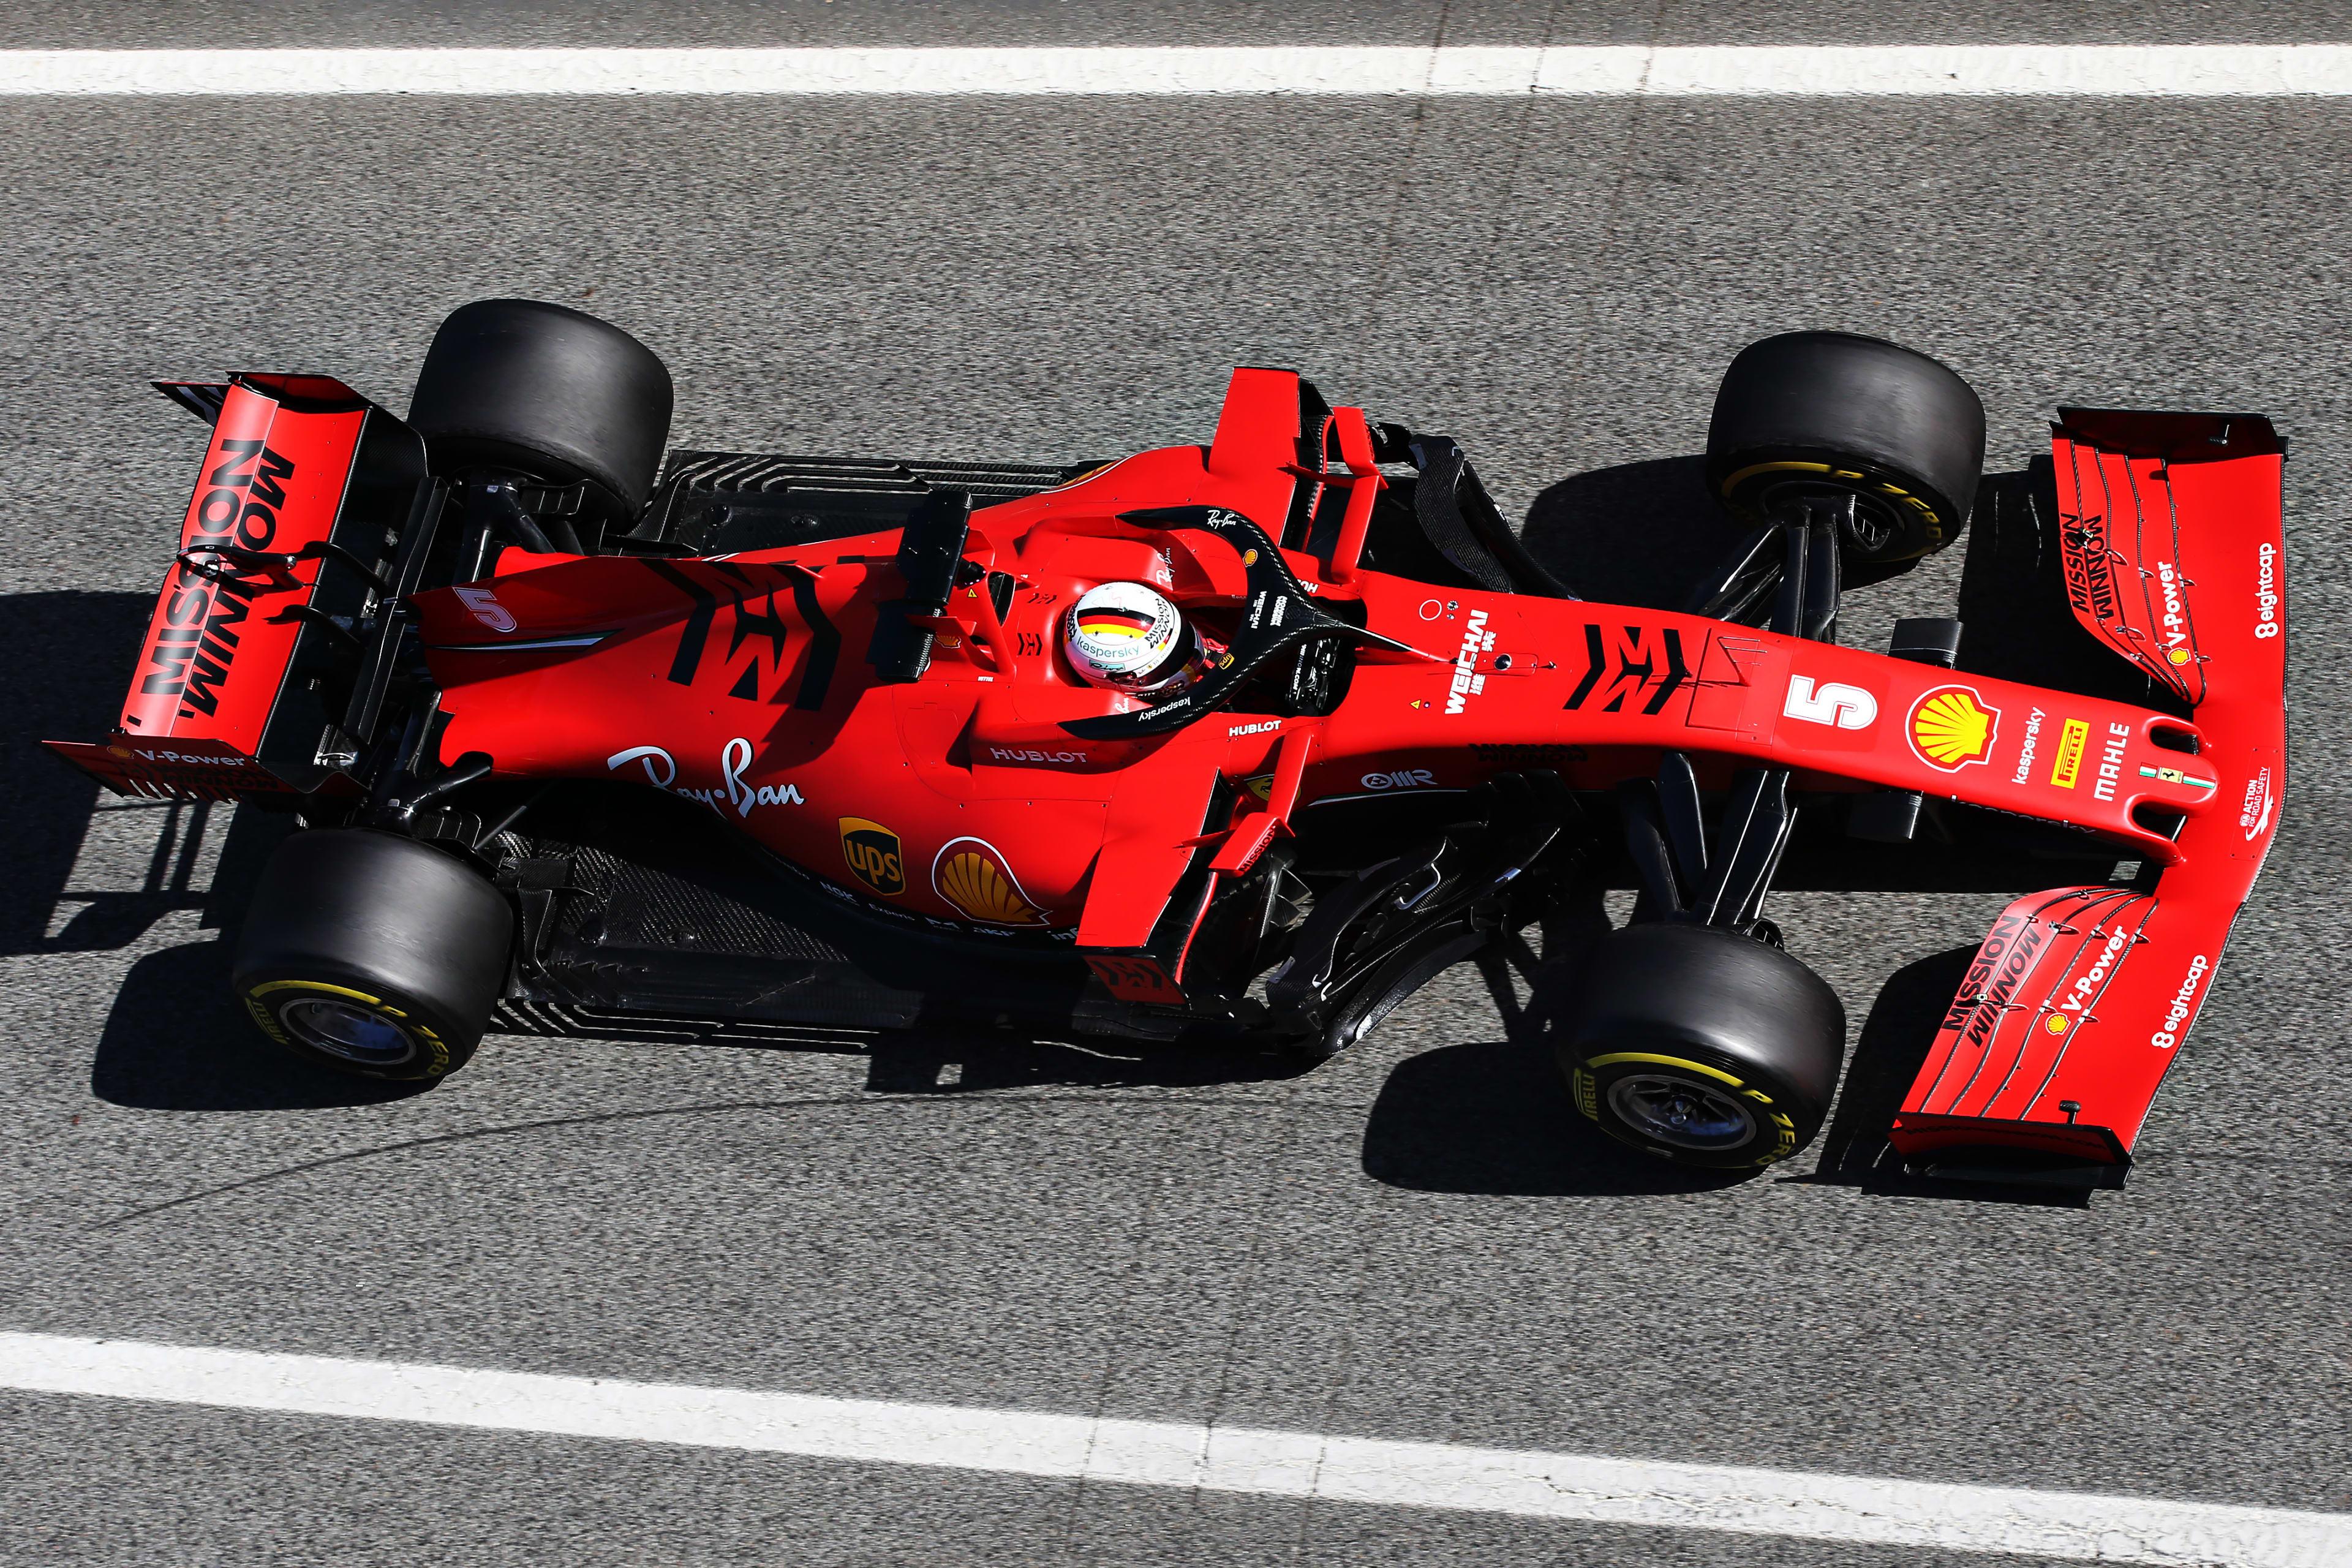 Fia Respond To Teams Over Ferrari Settlement Objection Formula 1